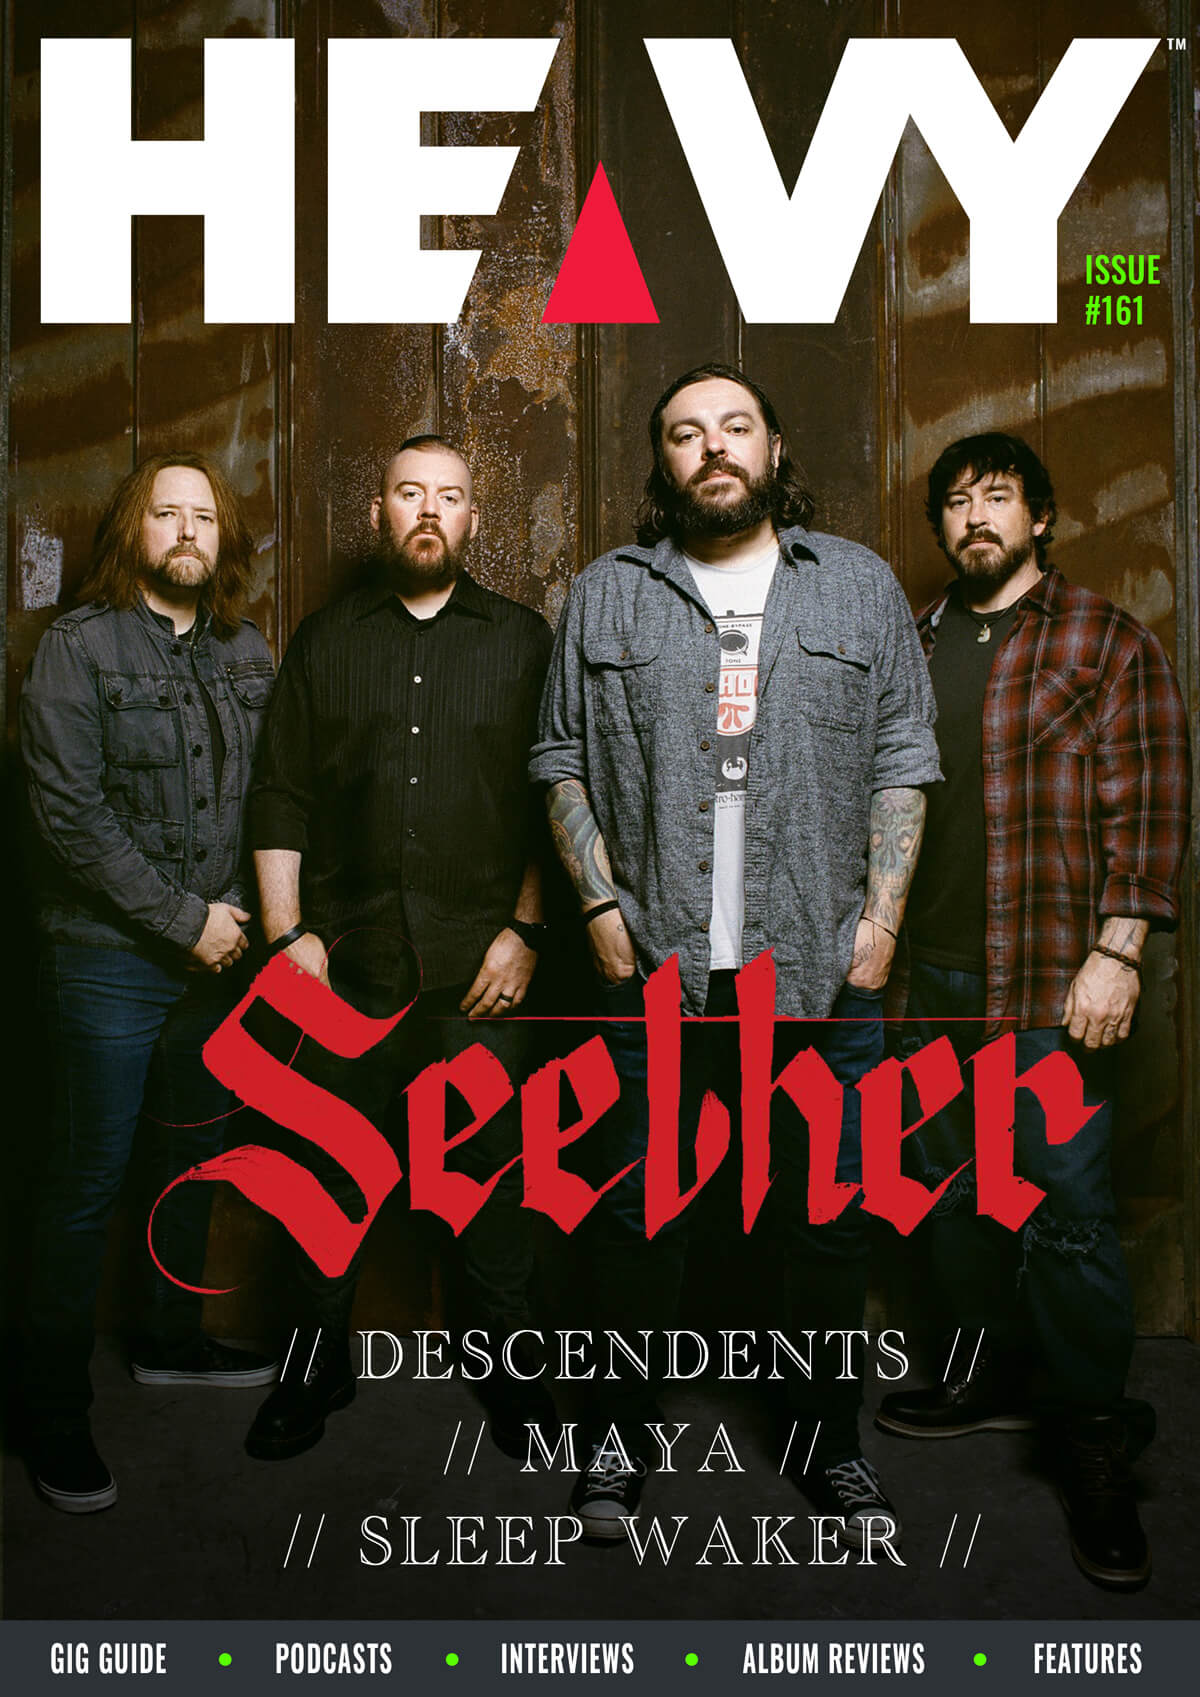 heavy-digi-mag-issue-#161